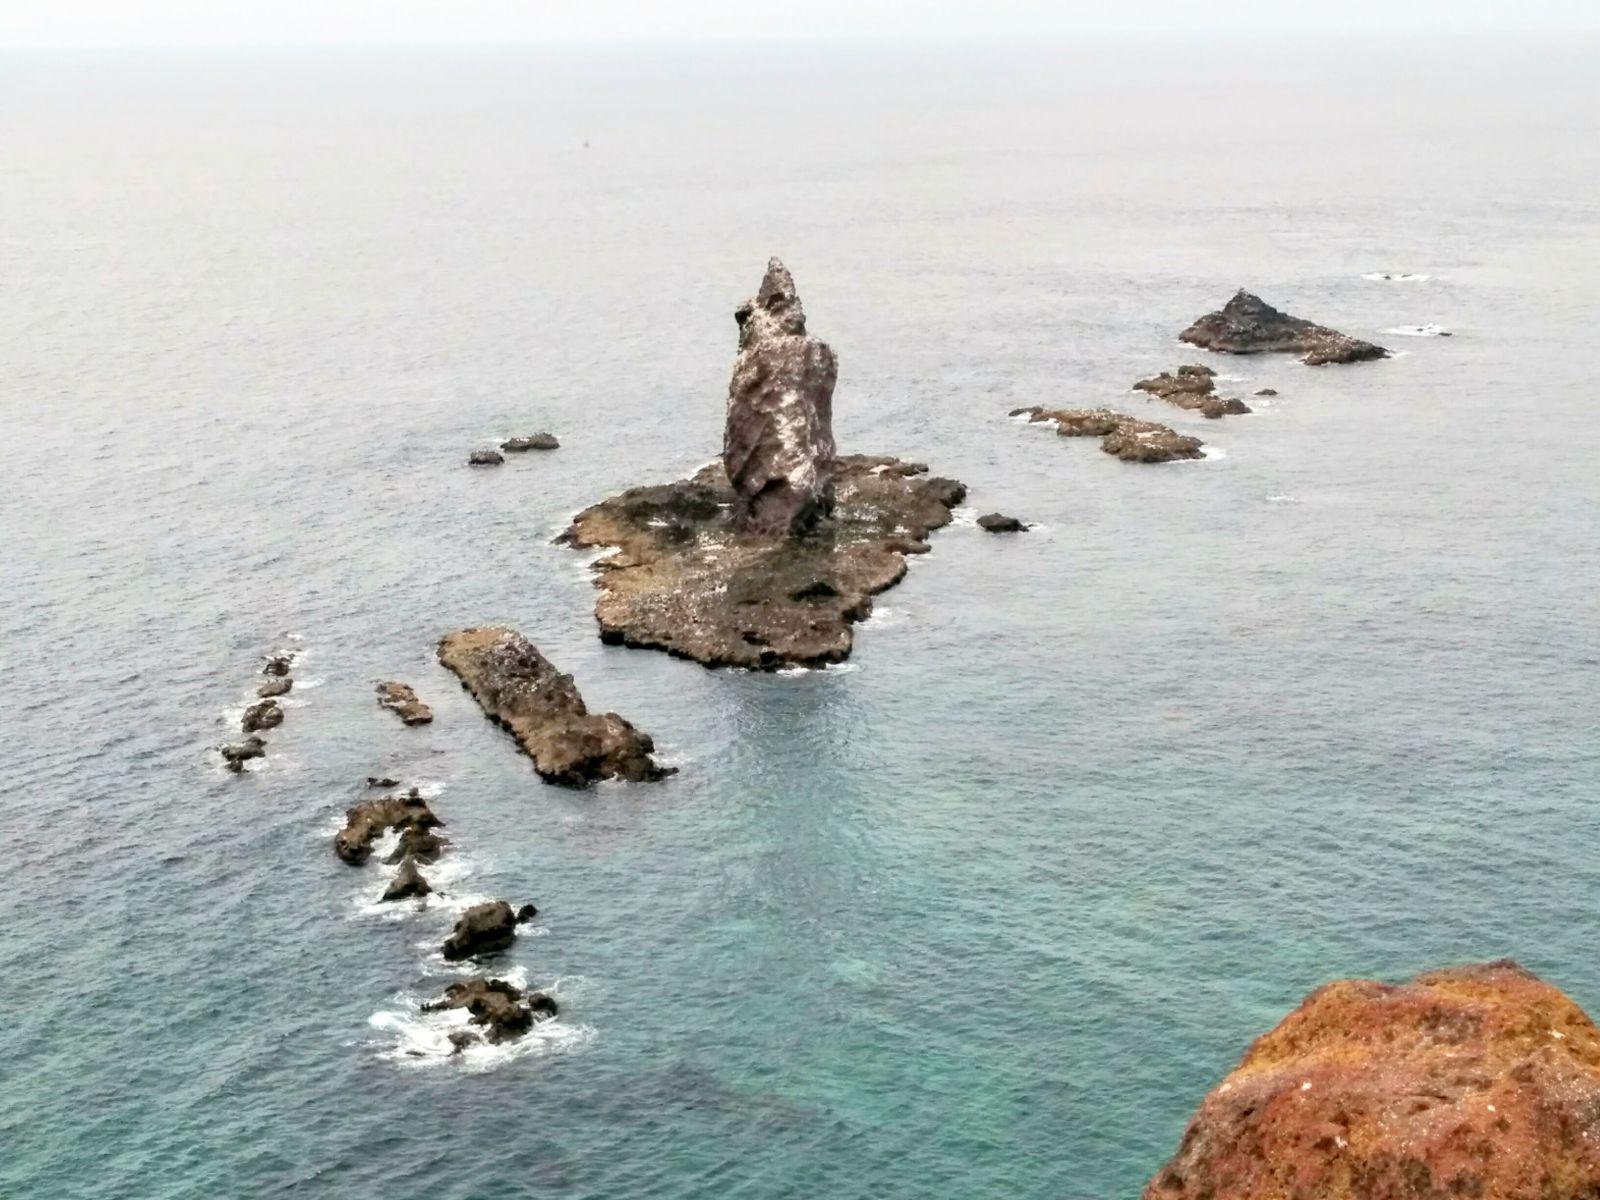 【積丹町】積丹・神威岬観光案内です。